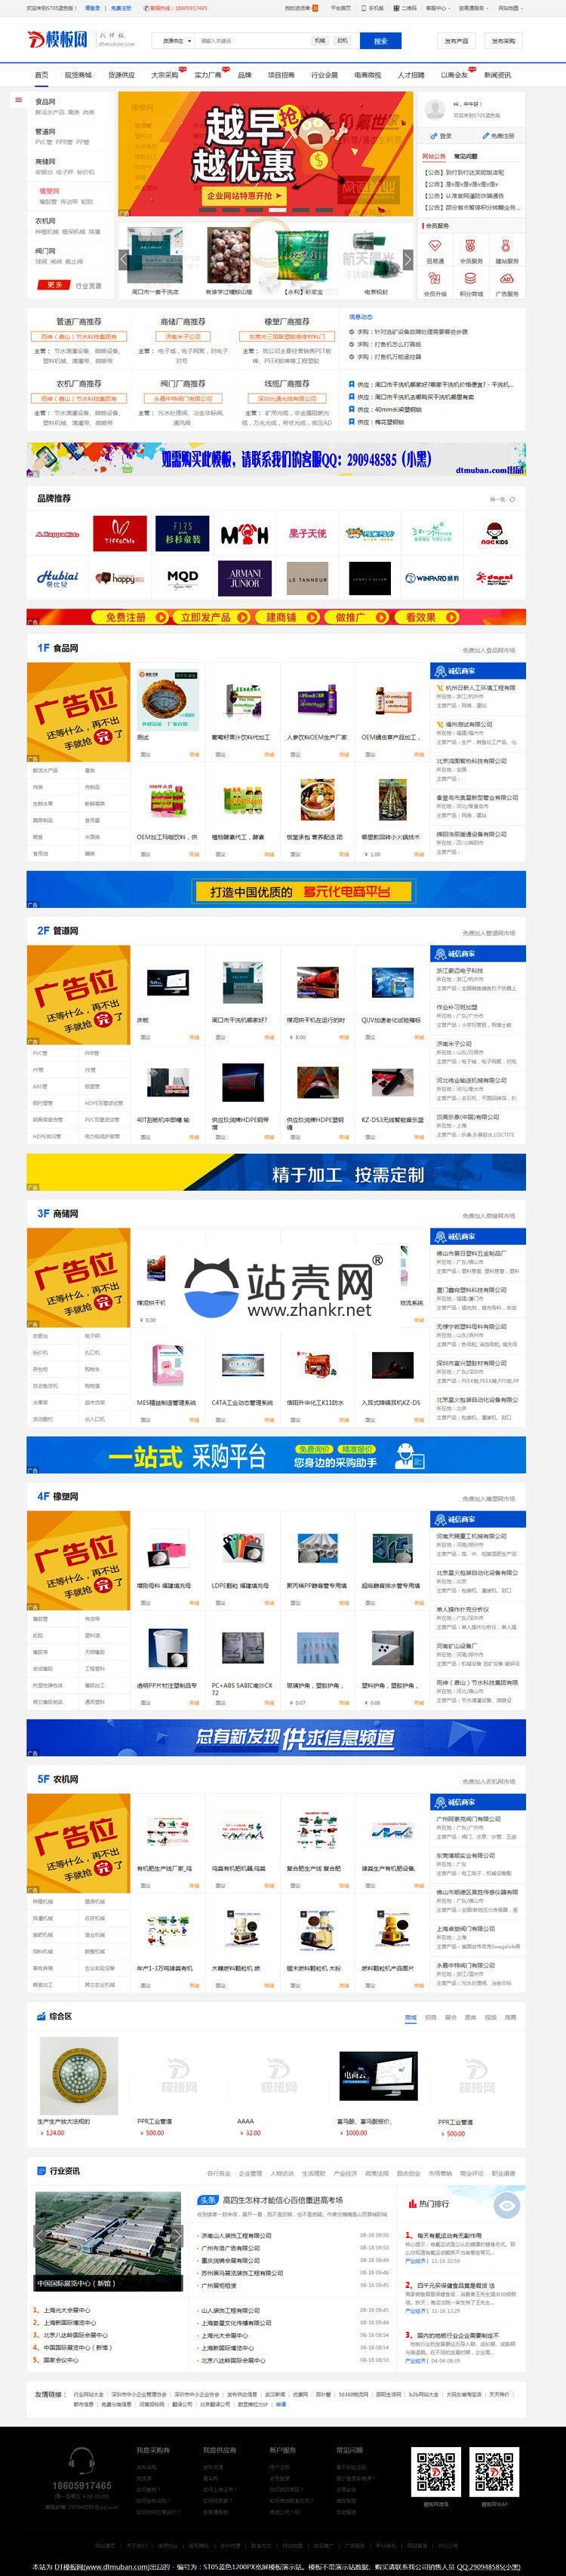 <i></i>destoon6.0模板 ST05蓝色宽屏B2B行业网站源码最新完整版+手机版_源码下载